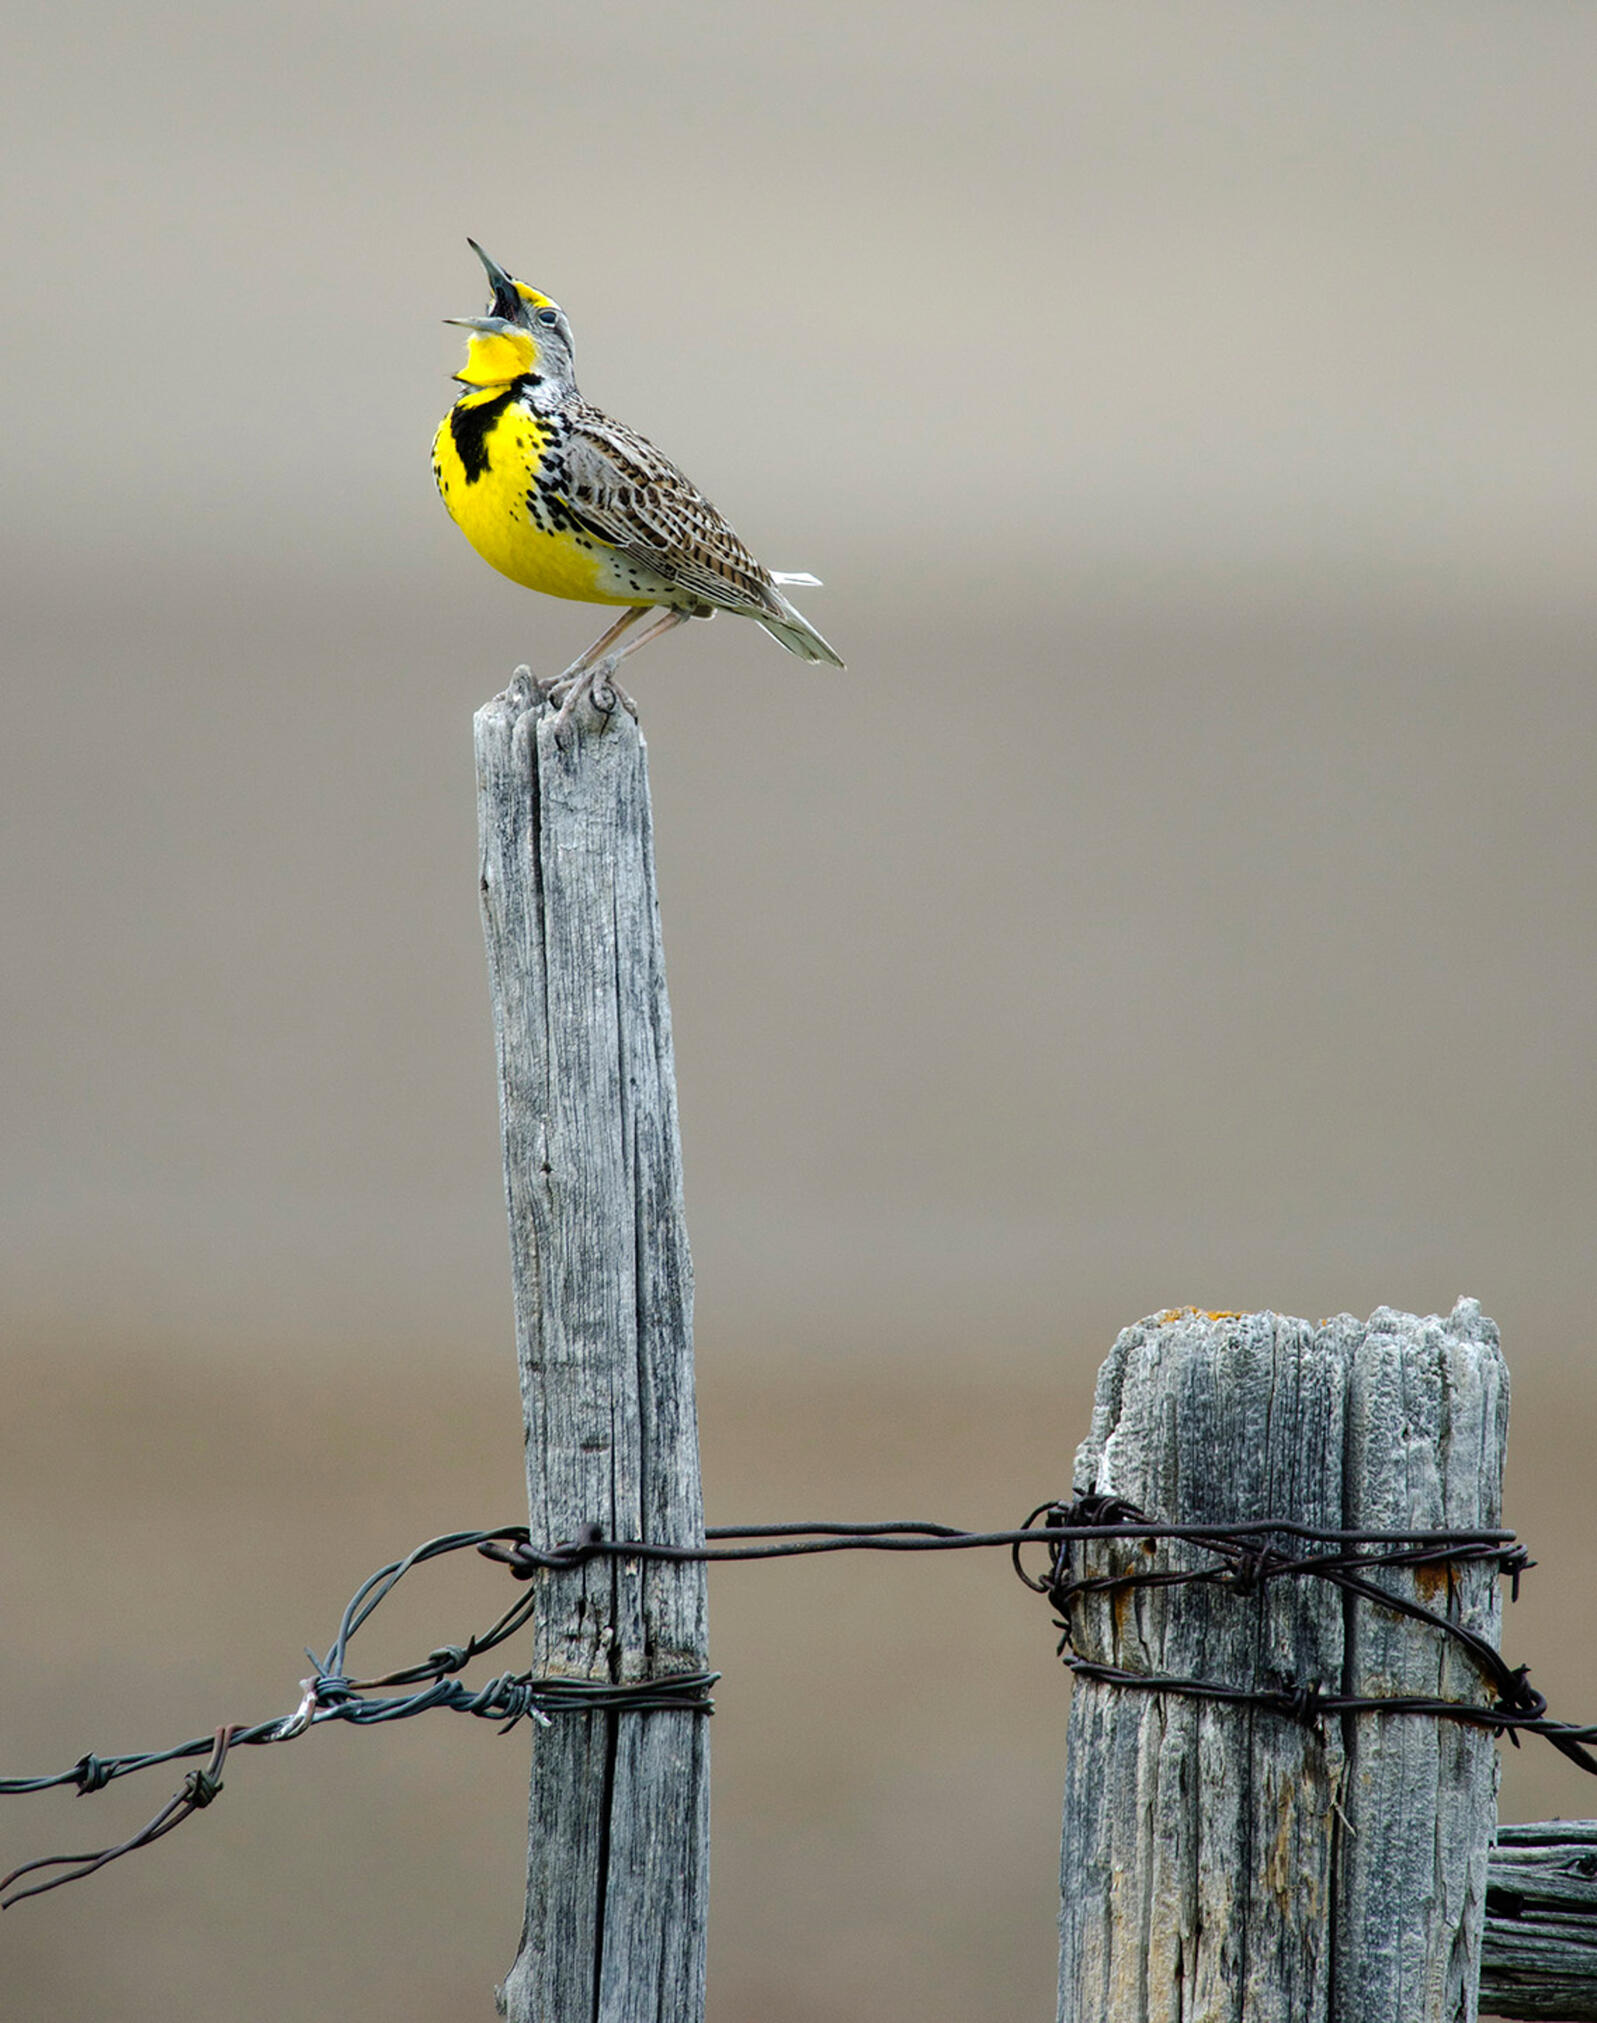 Western Meadowlark Robert Harwood/Audubon Photography Awards